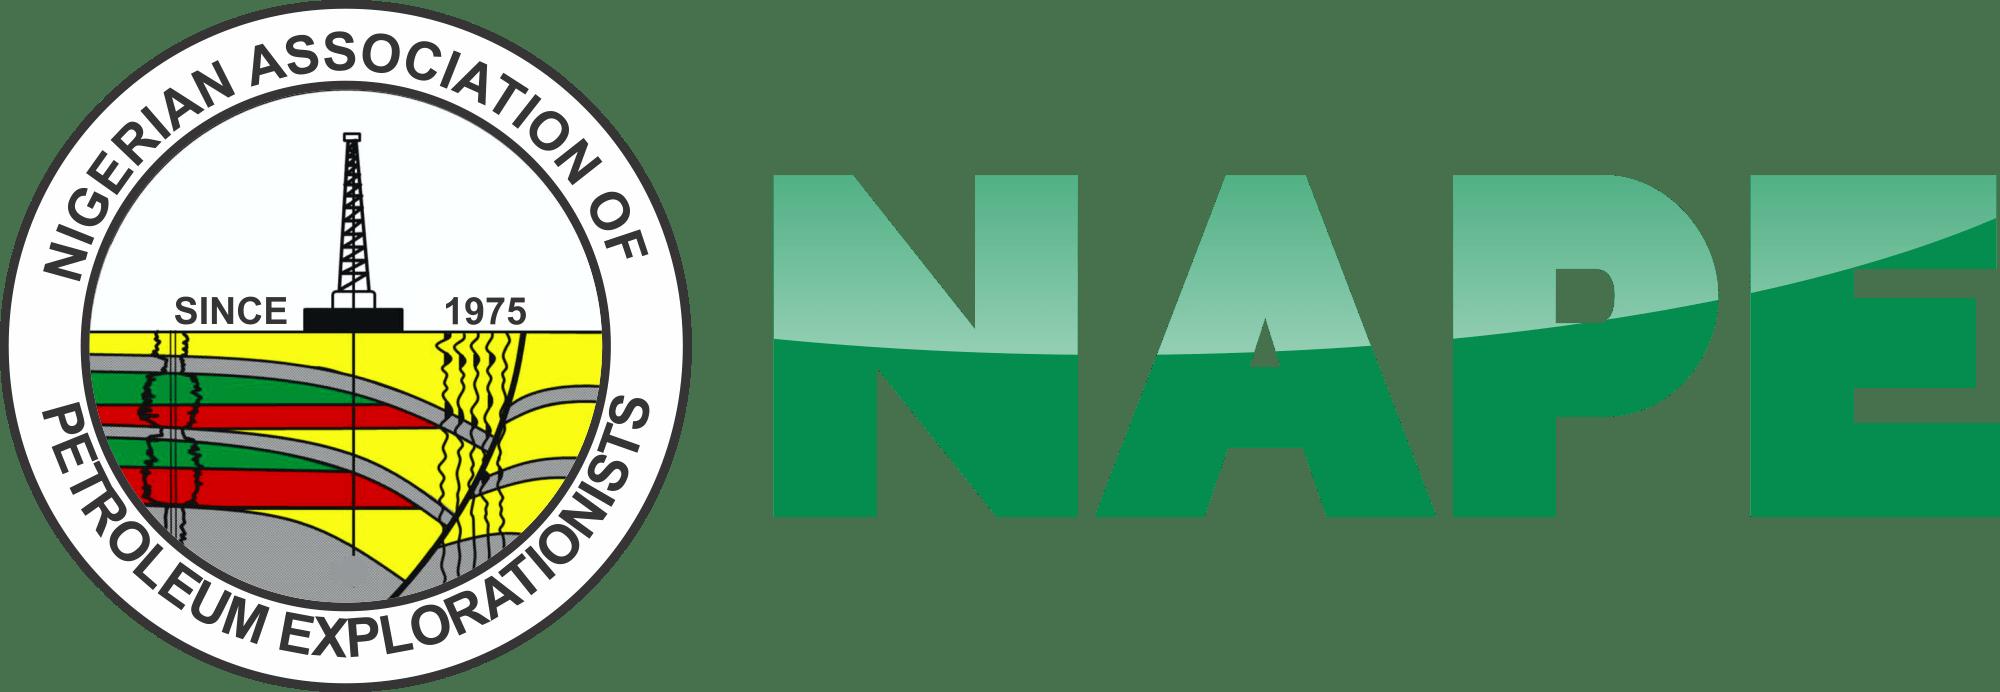 The Nigerian Association of Petroleum Explorationists